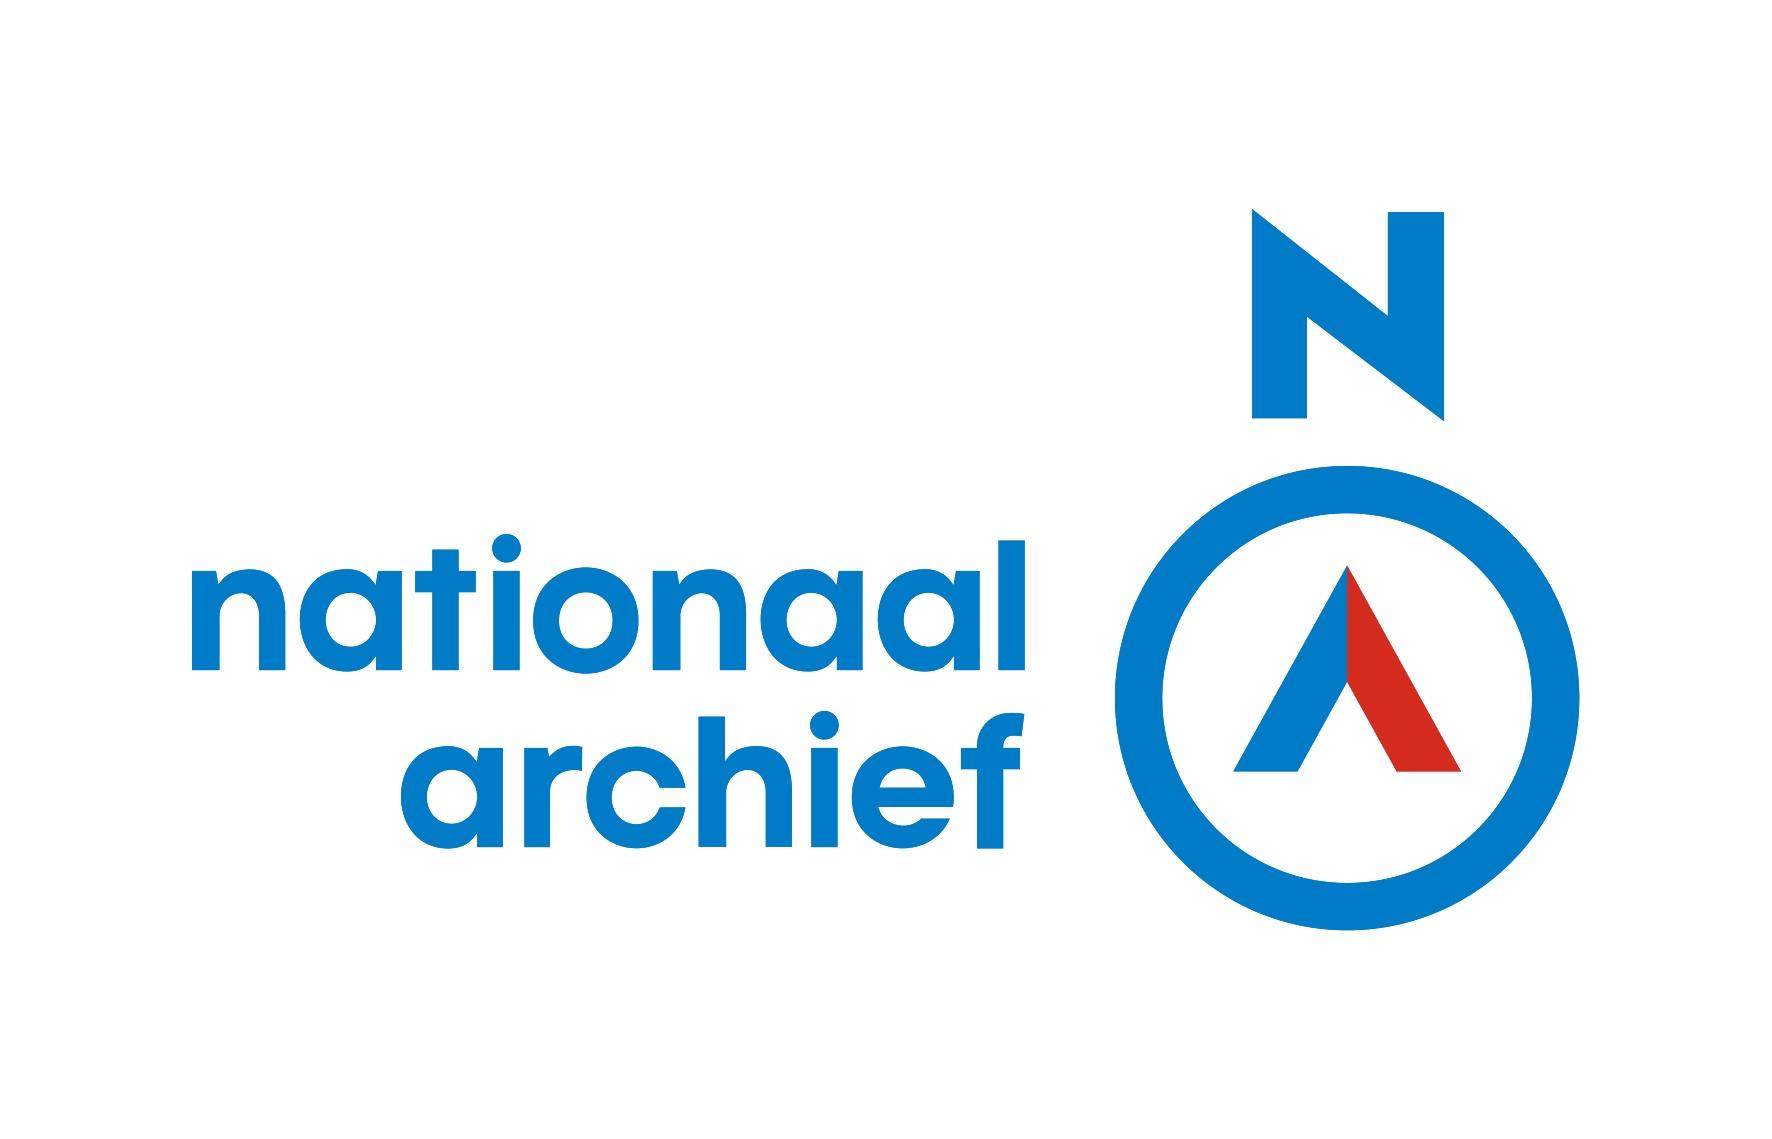 Nationaal achief logo